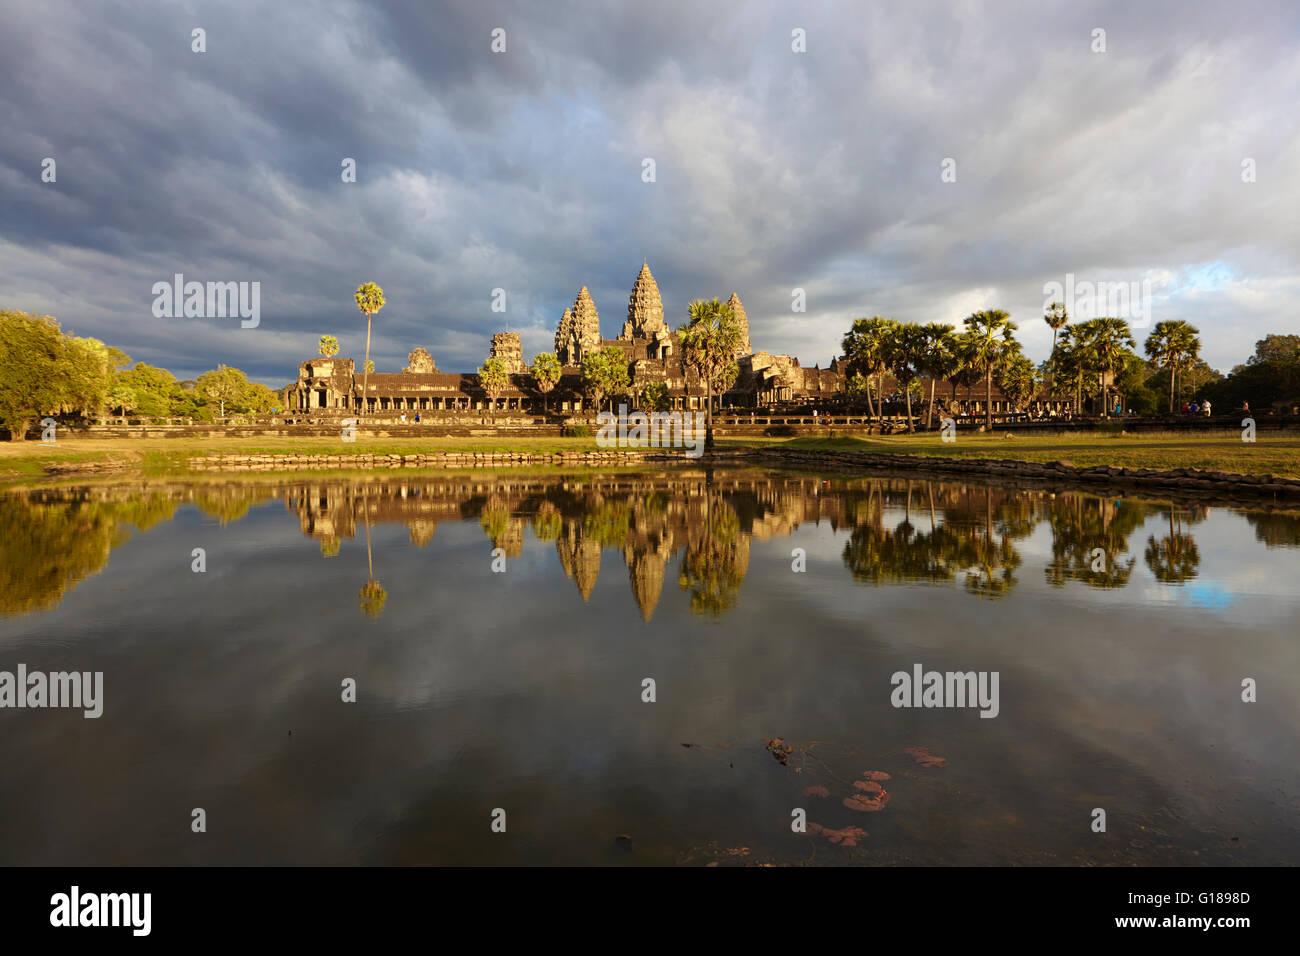 Temple d'Angkor Wat, Siem Reap, Cambodge Banque D'Images